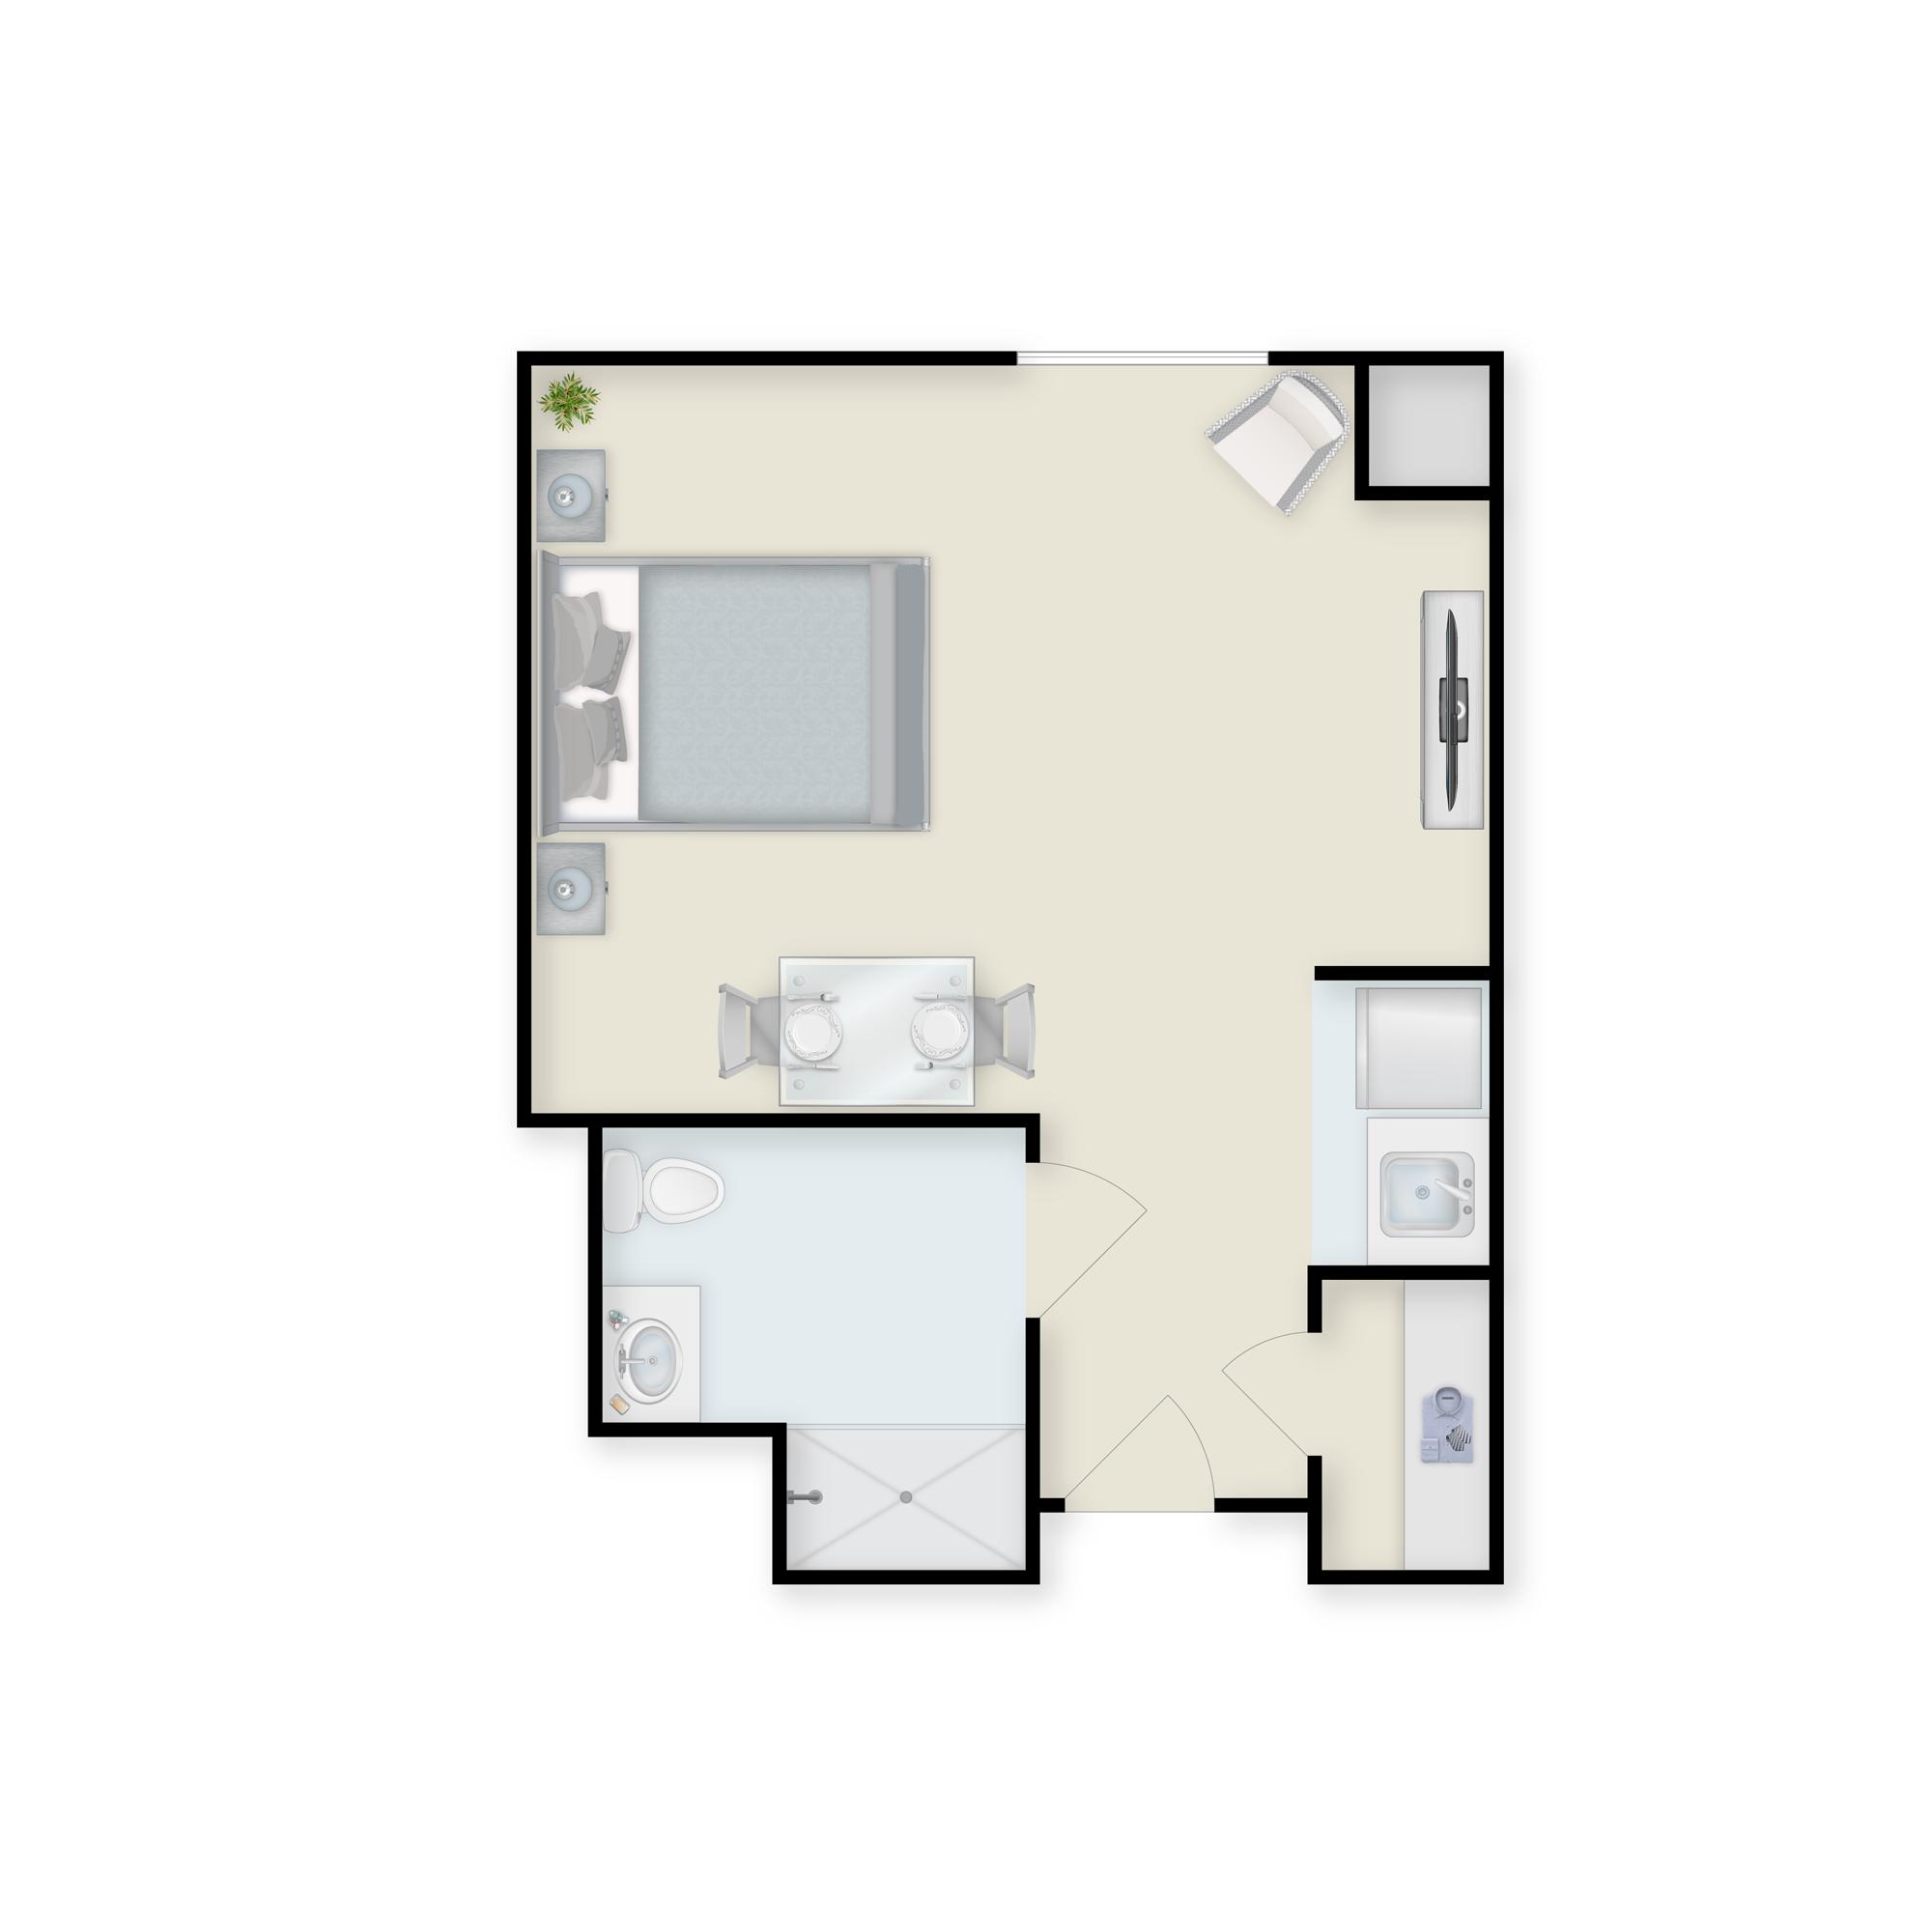 Charter Senior Living of Towson studio apartment floor plan